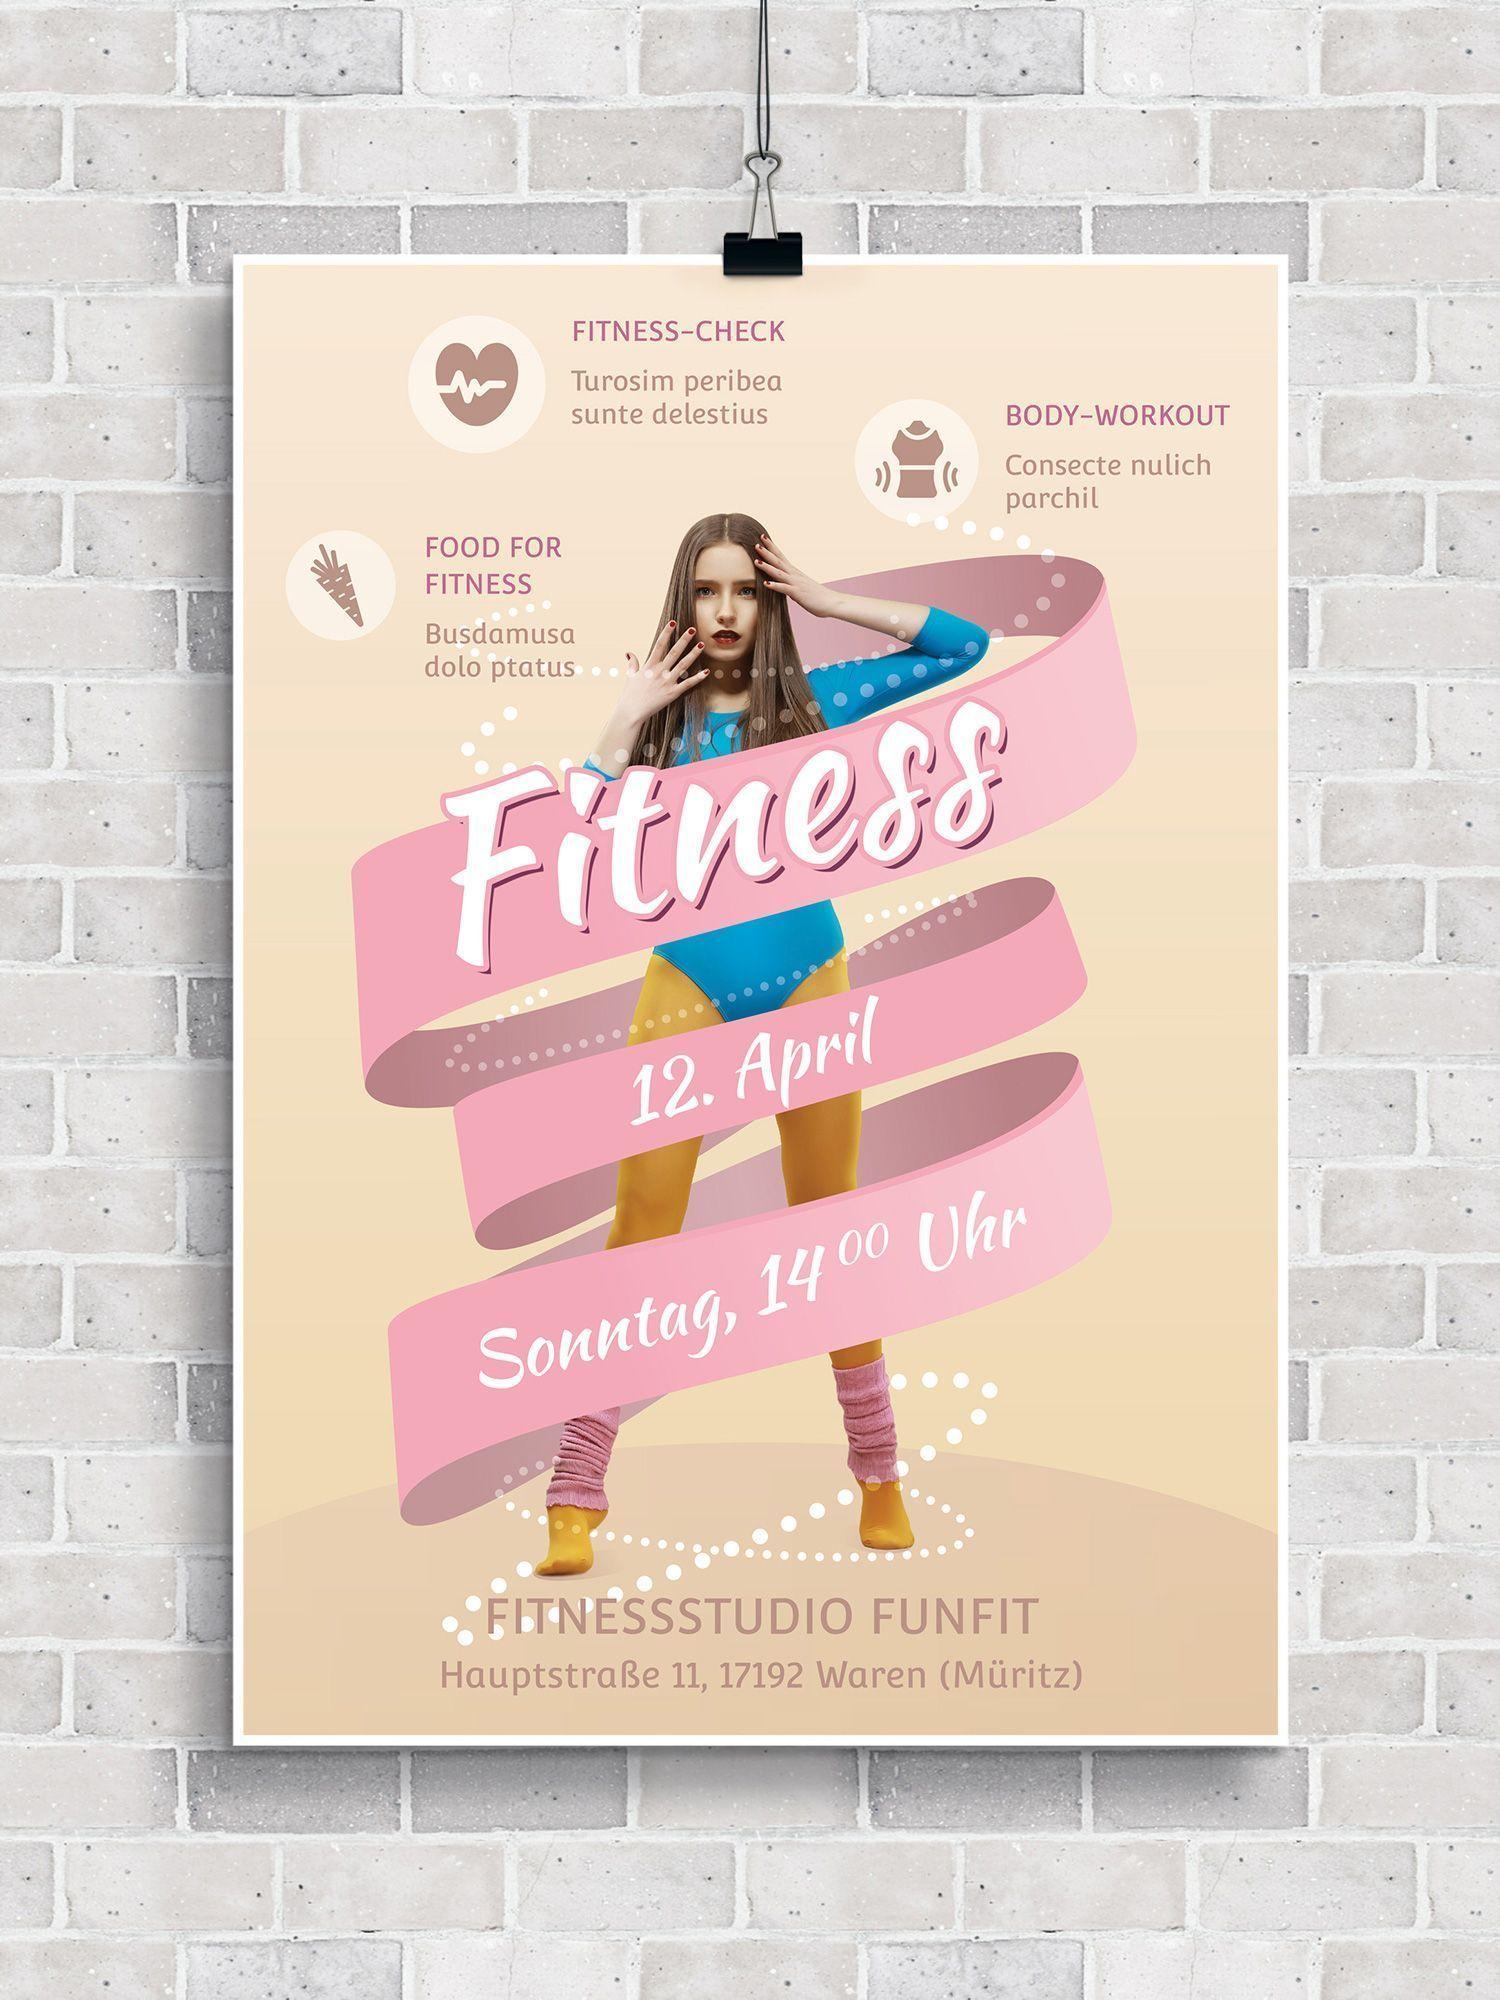 #fitness #fitnessstudio #fitnessstudio probetraining #Fitnessstudios #FlyerVorlagen #für #probetrain...